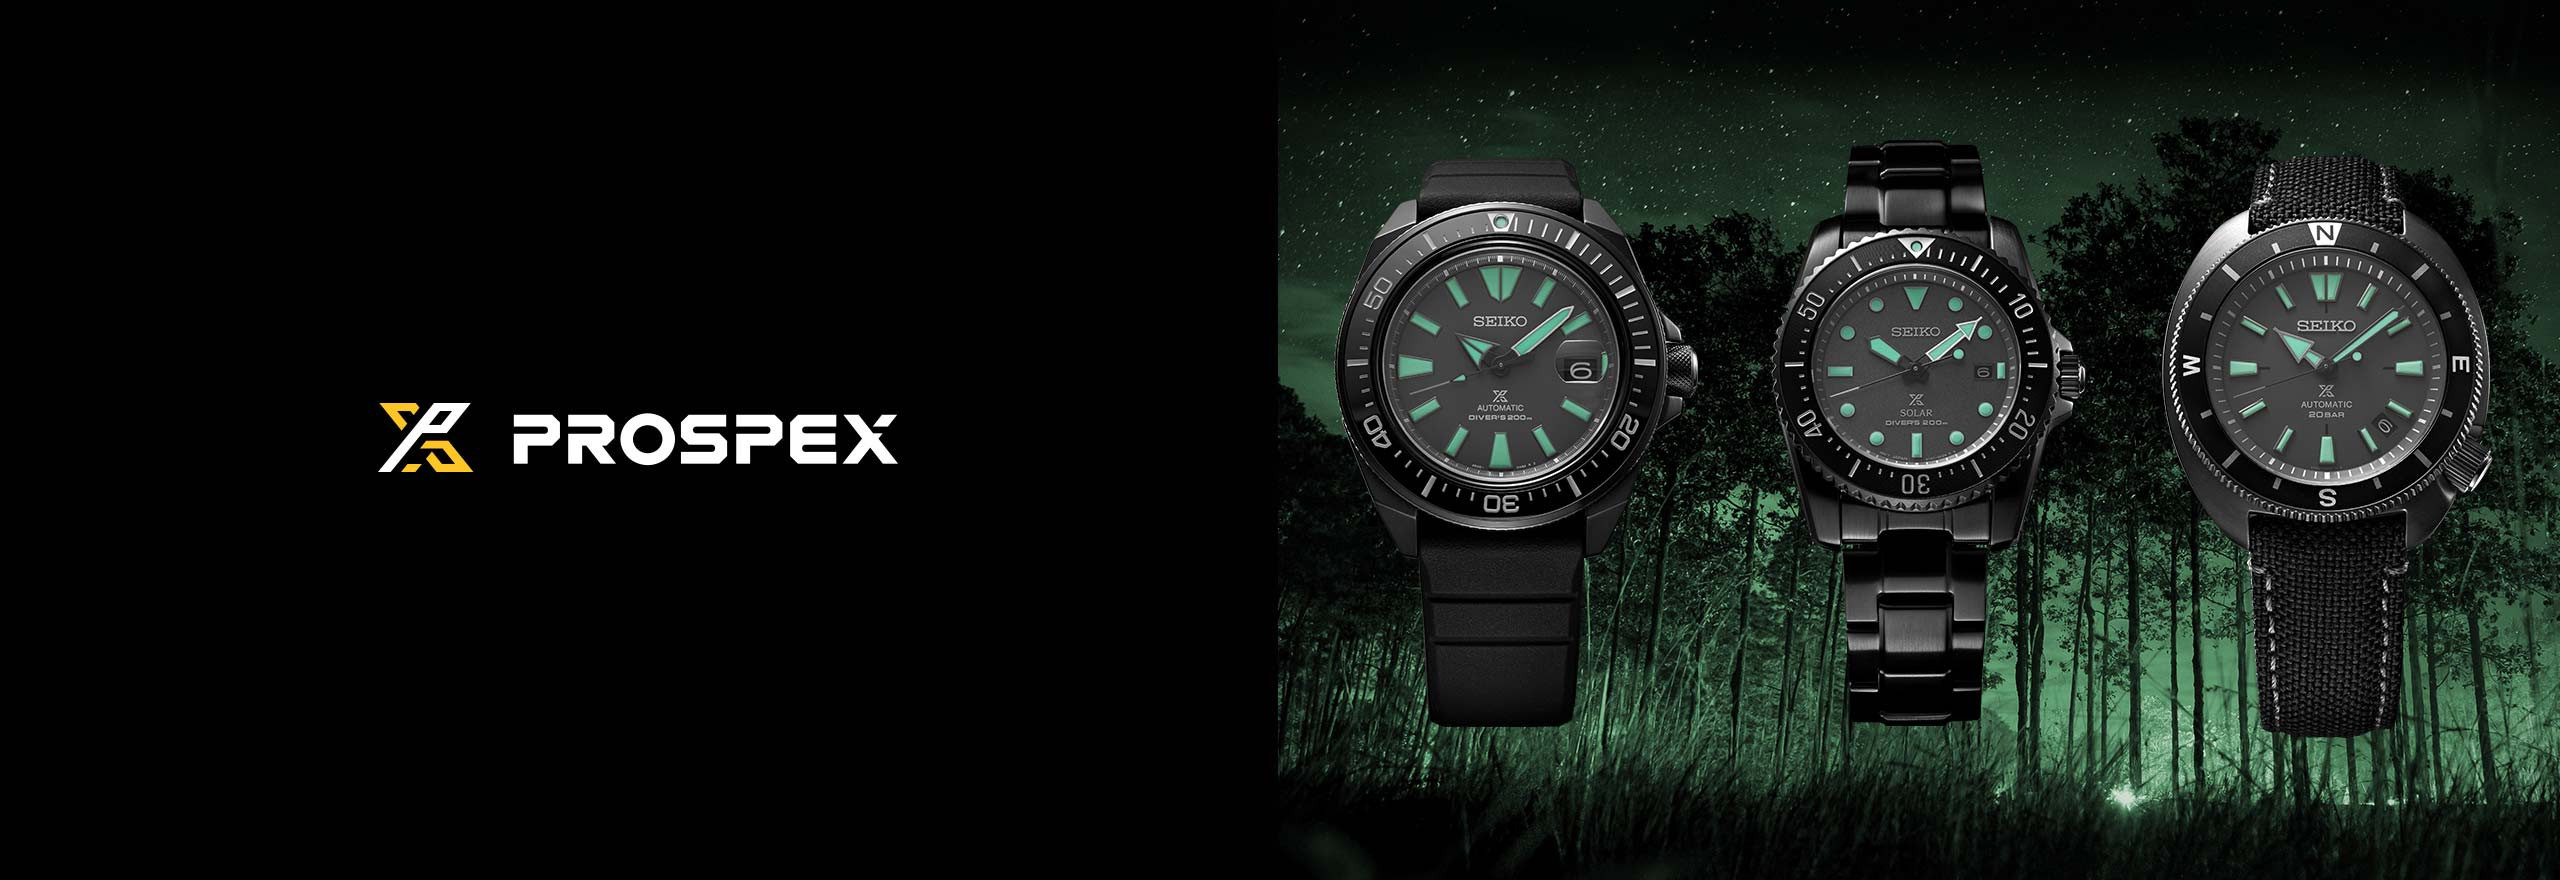 Novedades Relojes Seiko. Seiko Boutique Tienda Online Oficial